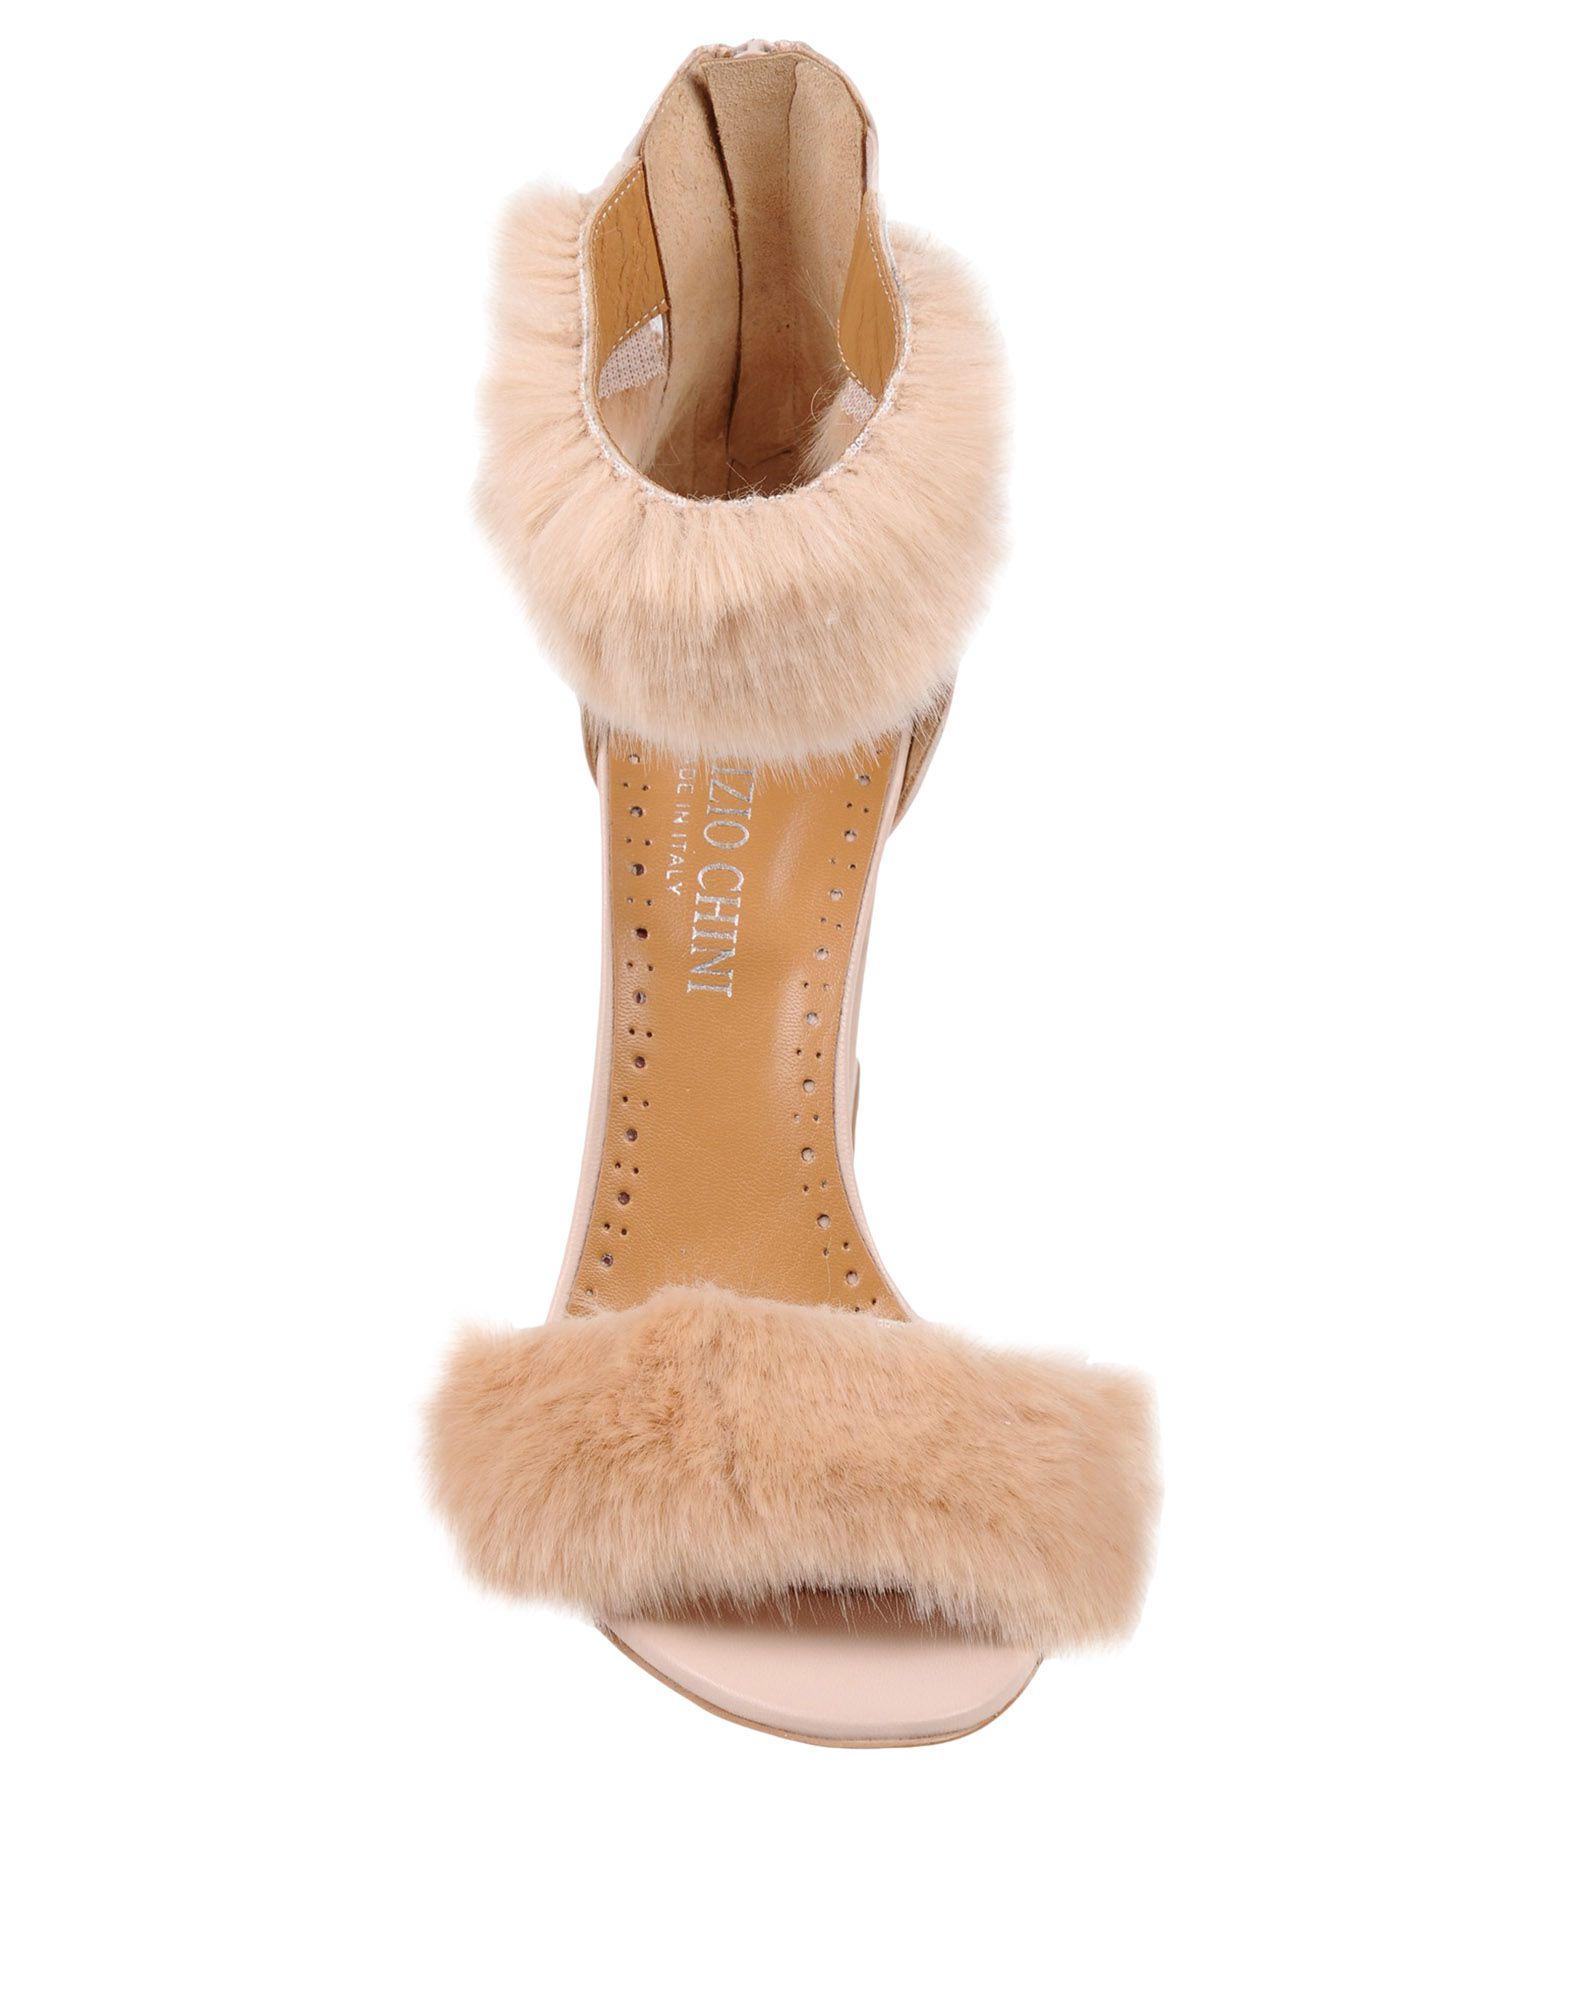 Fabrizio Chini Sandalen Damen  11423584CE Gute Qualität beliebte Schuhe